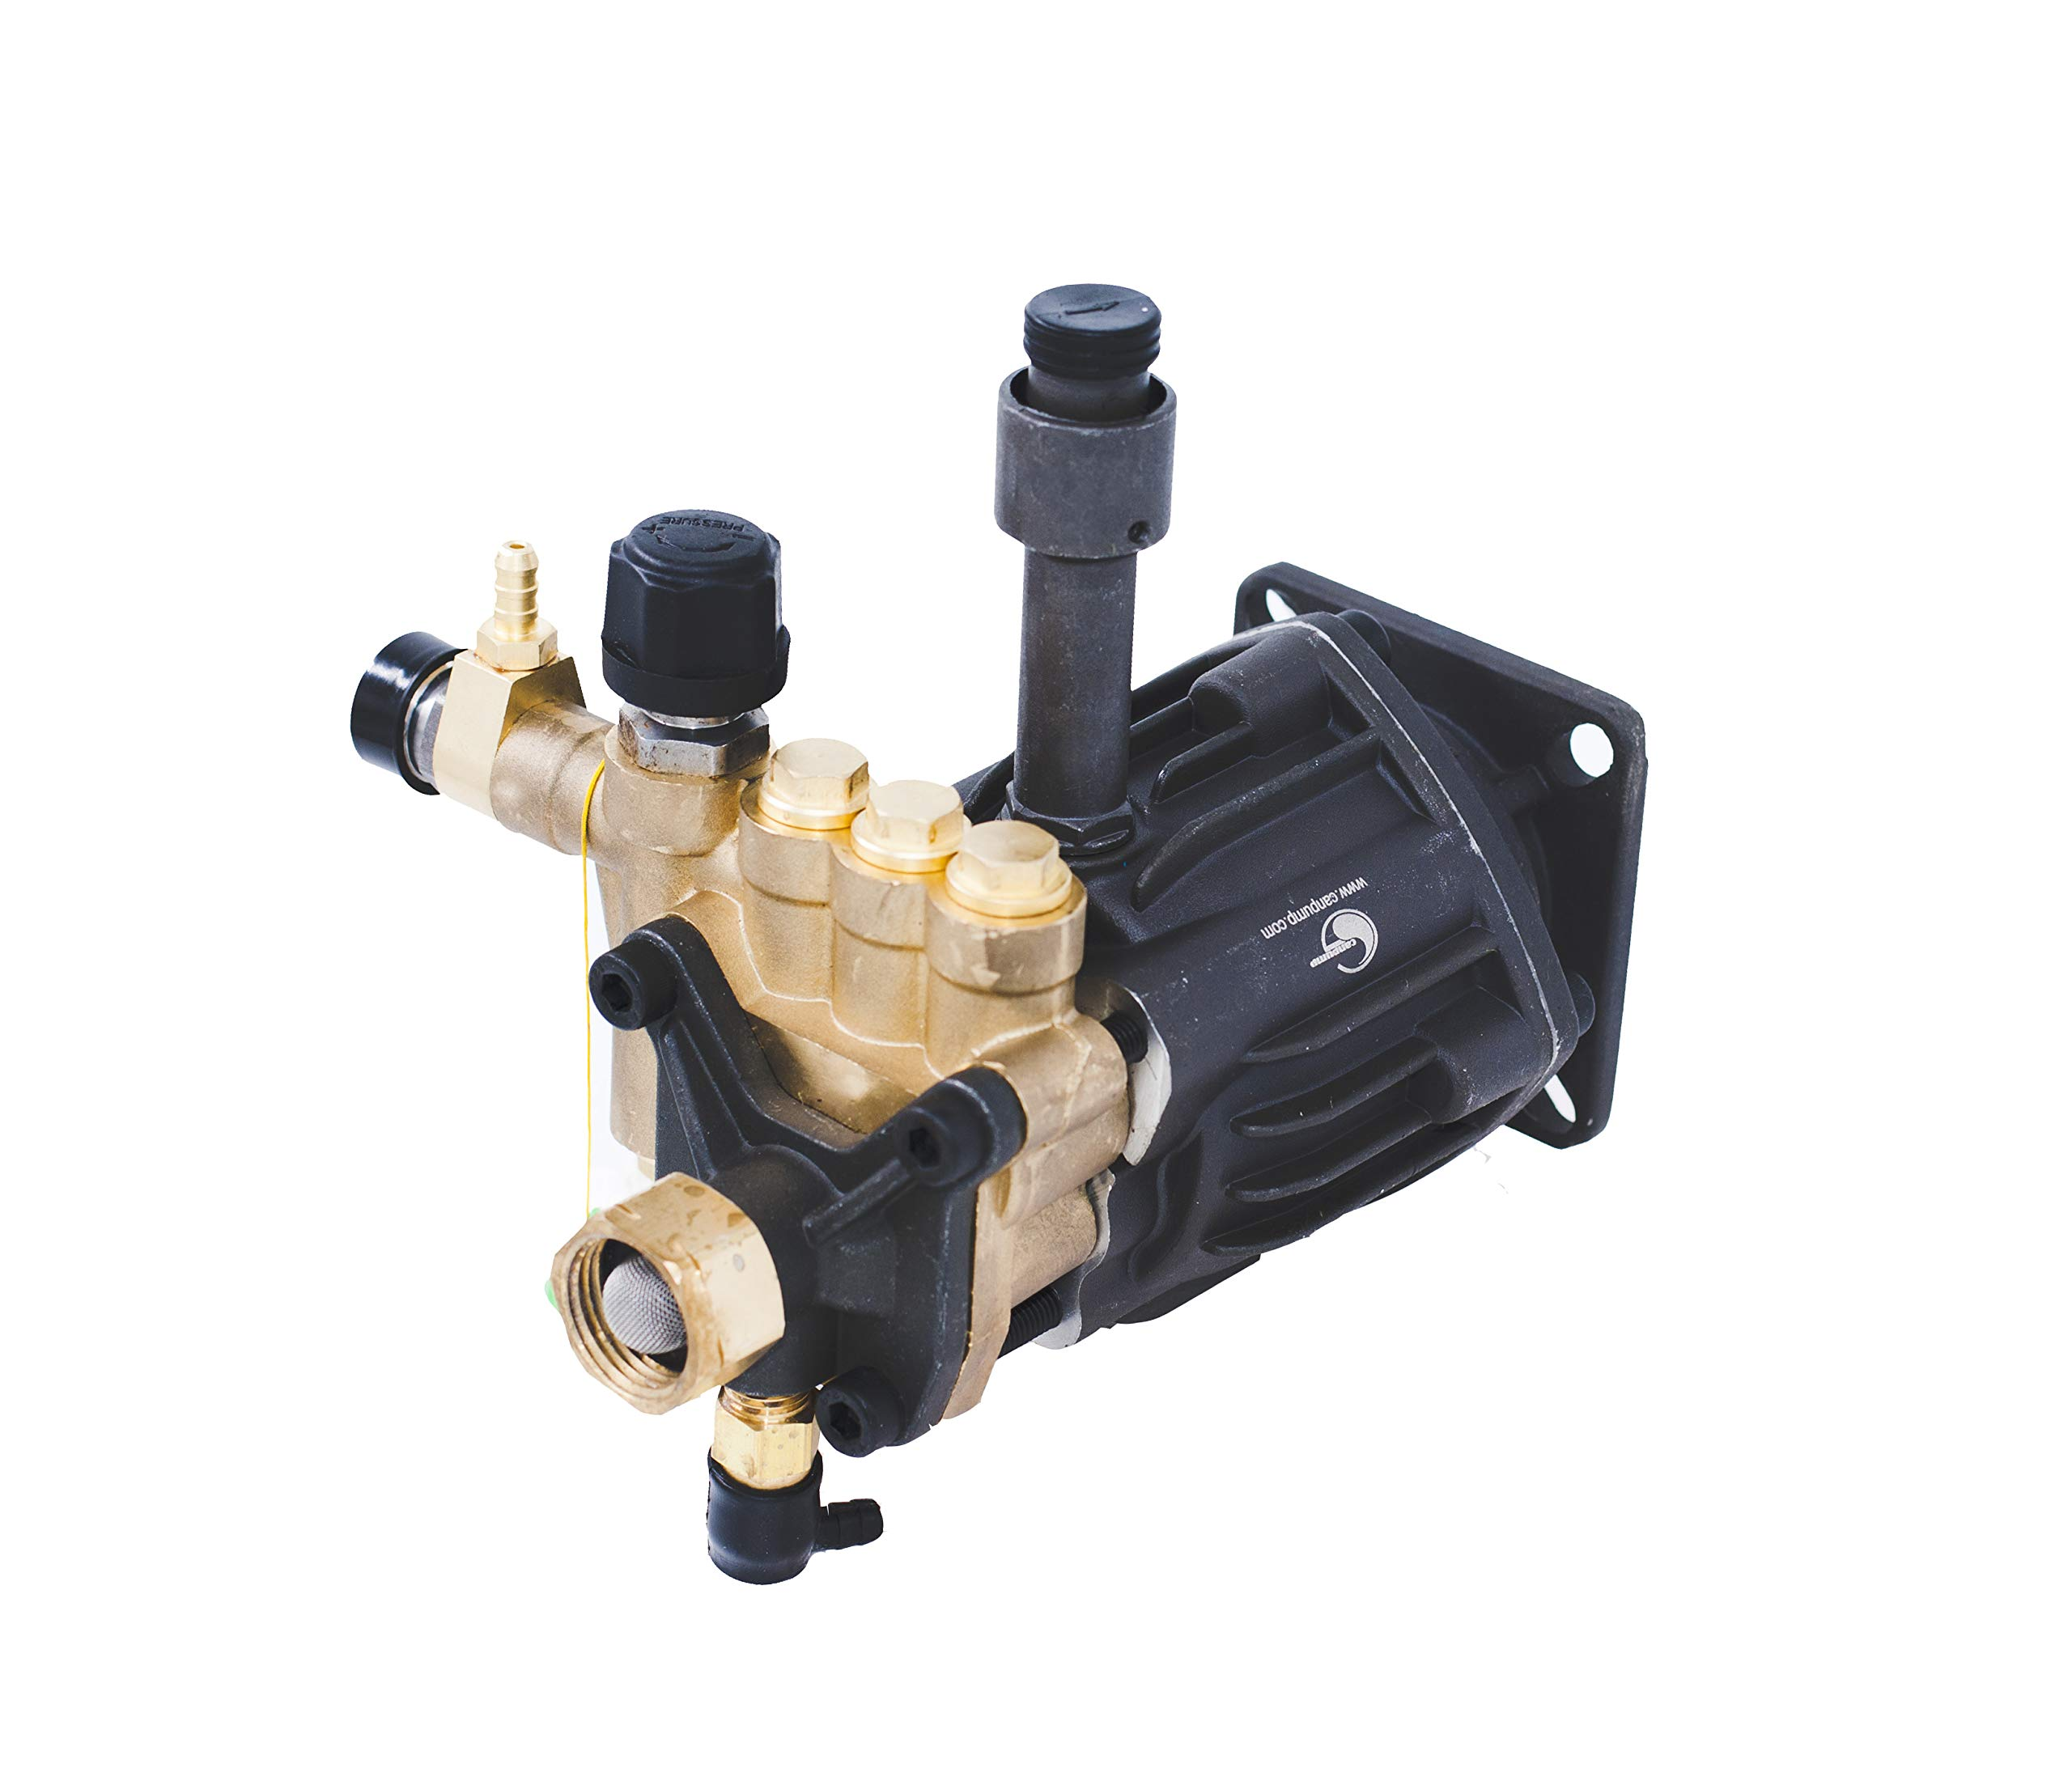 "CANPUMP Axial High Pressure Washer Pump 2700 psi 6.5 HP 3/4"" Shaft fits Cat General AR"